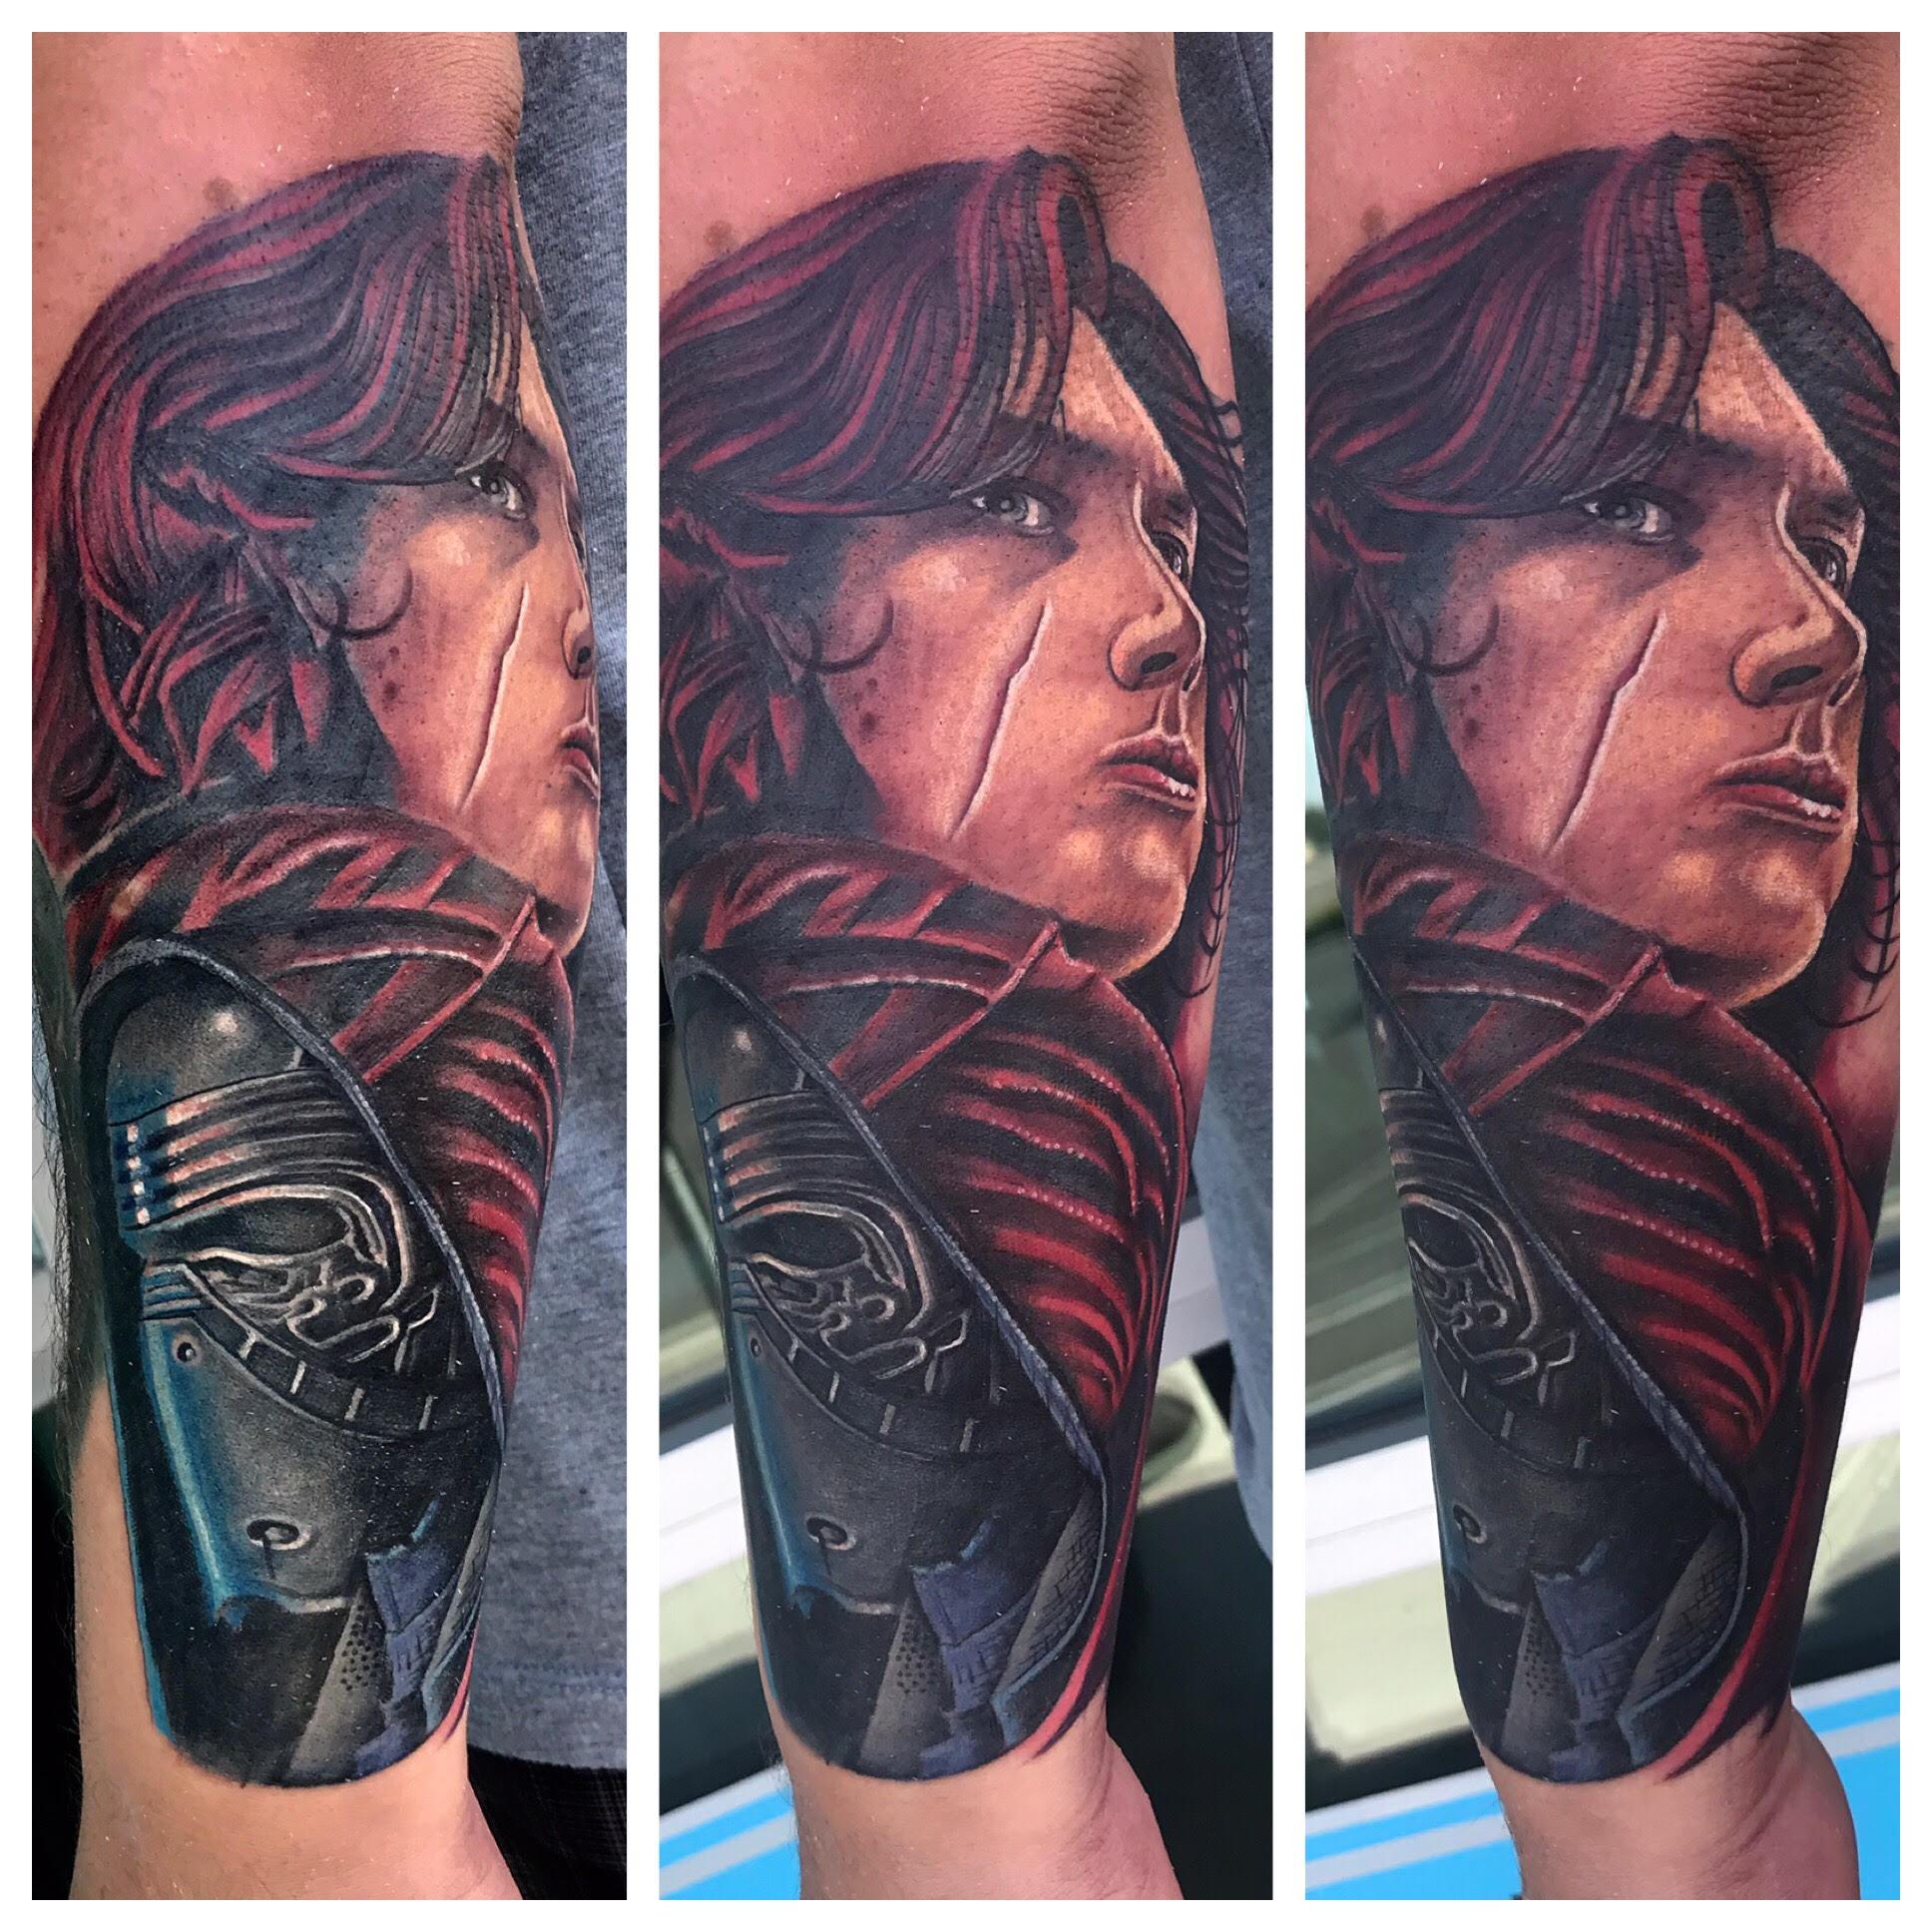 Kylo Ren Tattoo by Krystof